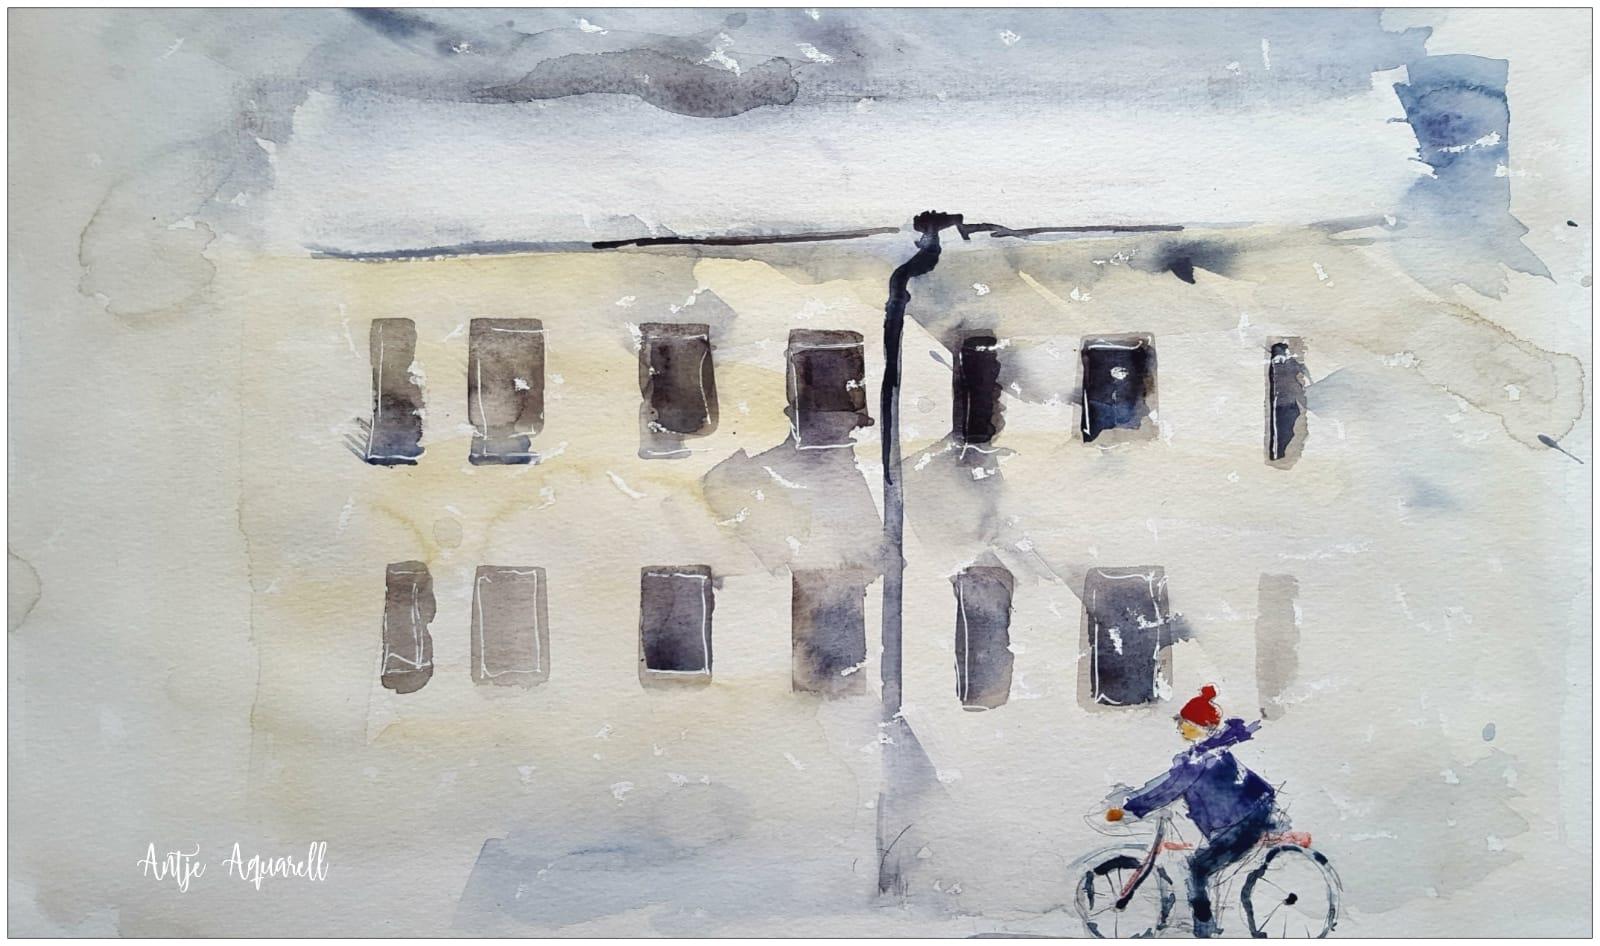 1.12., Aquarell von Antje Koßmagk, Lübbenau, A14